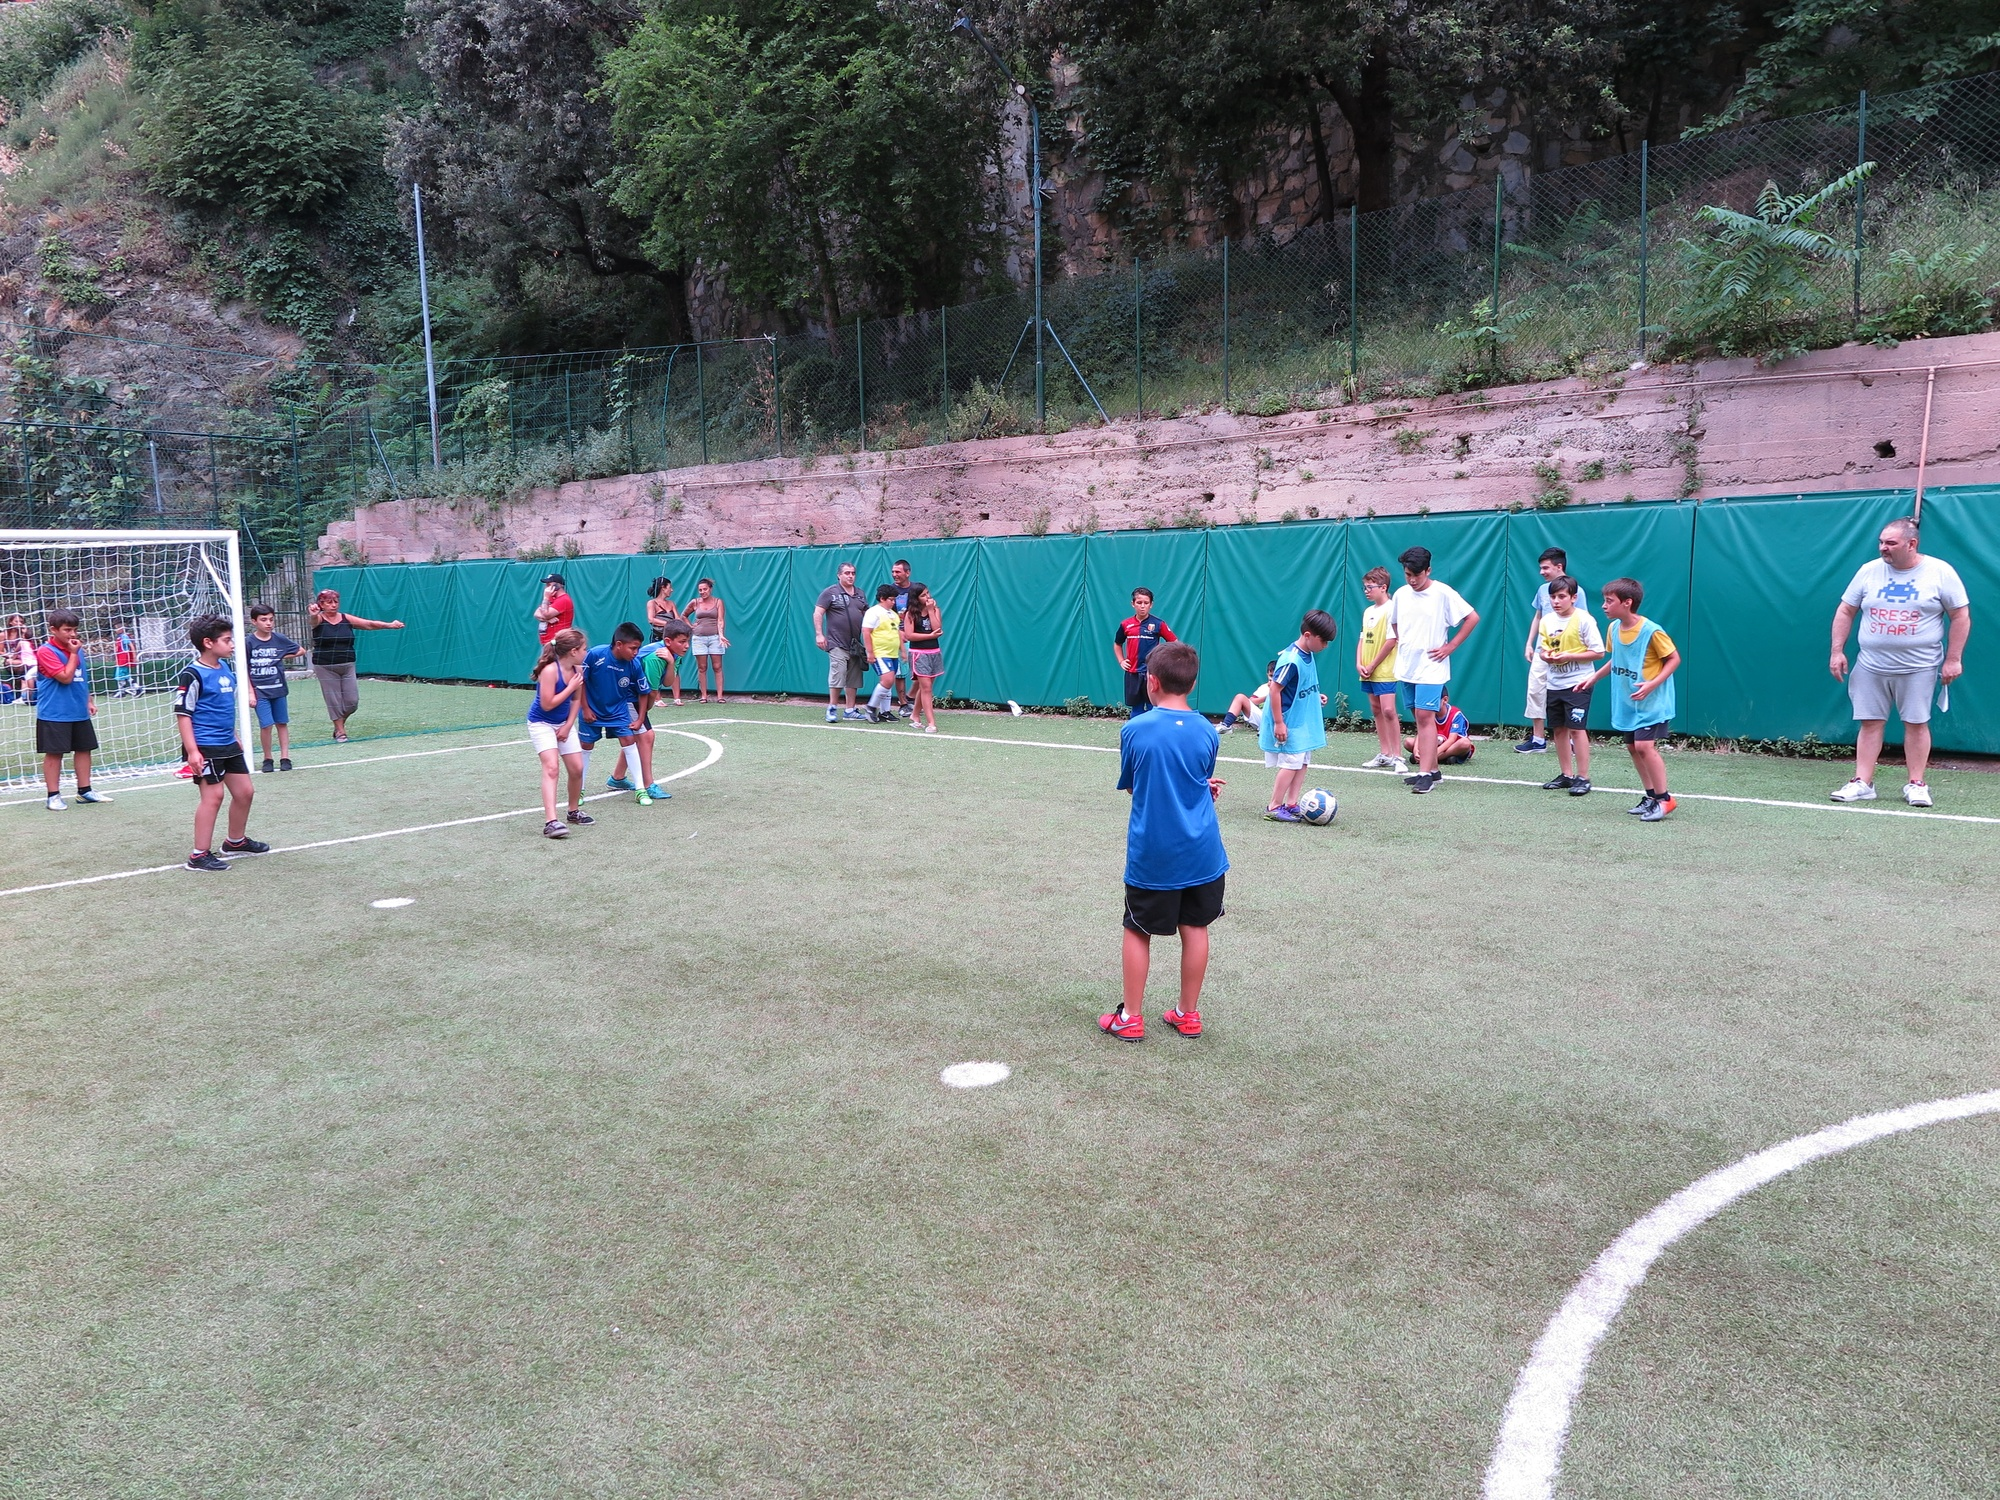 torneo-bambini-2016-06-30-16-52-28